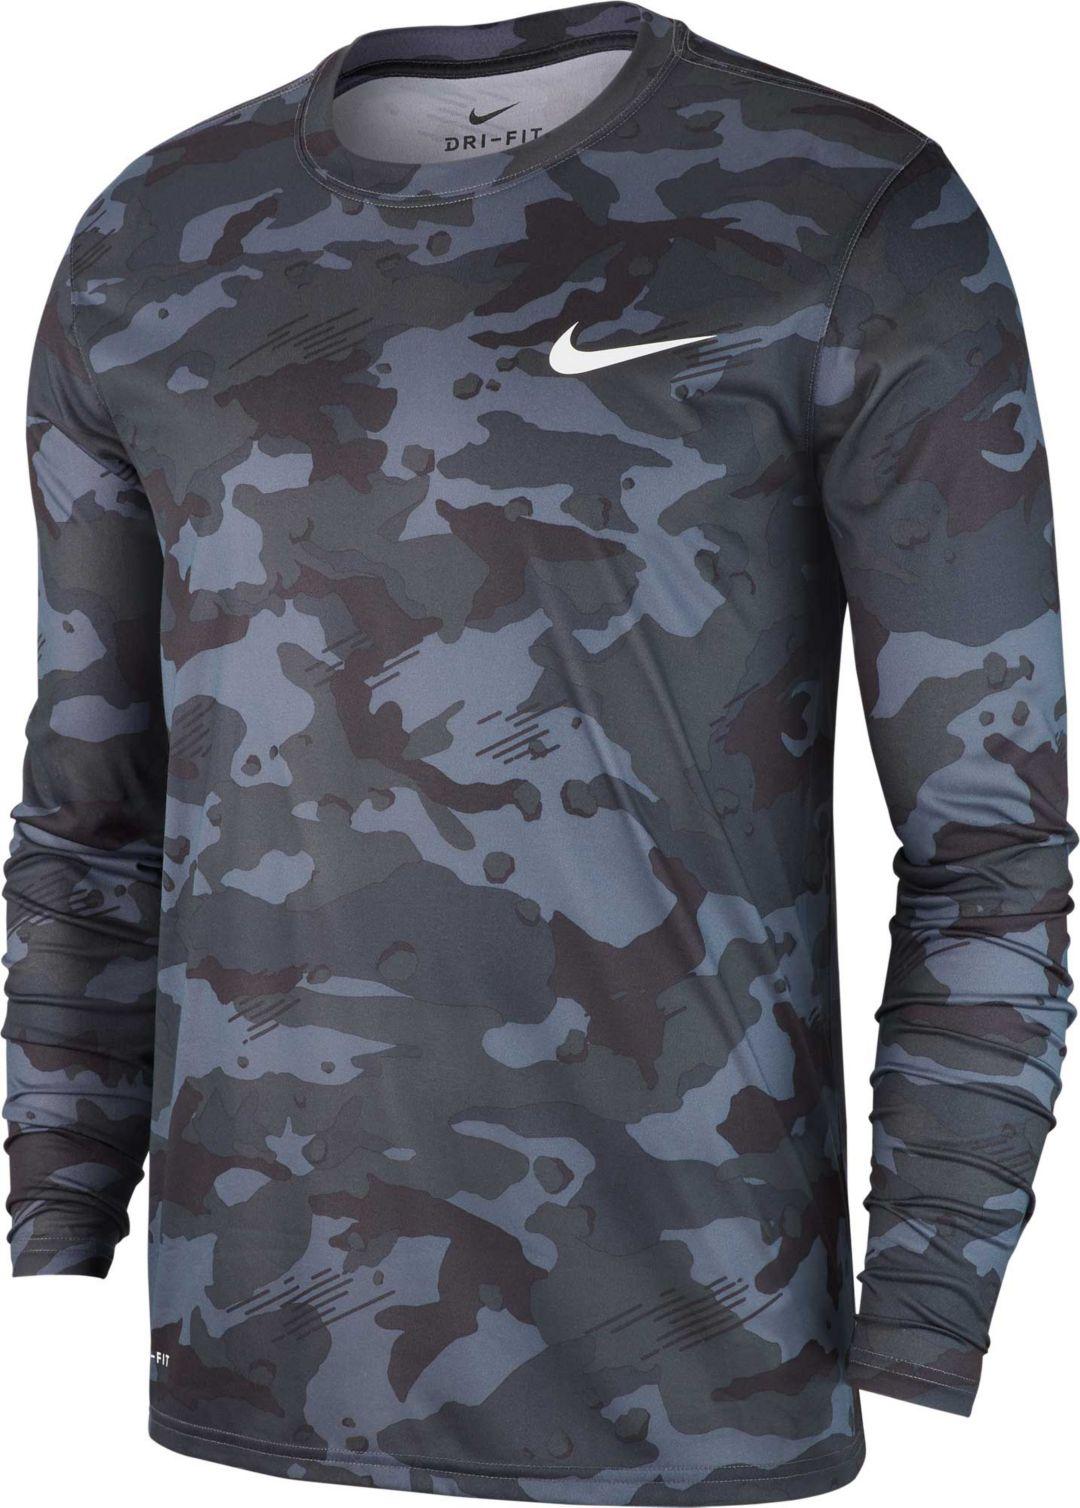 67d8c52a Nike Men's Dry Legend Camo Long Sleeve Tee | DICK'S Sporting Goods